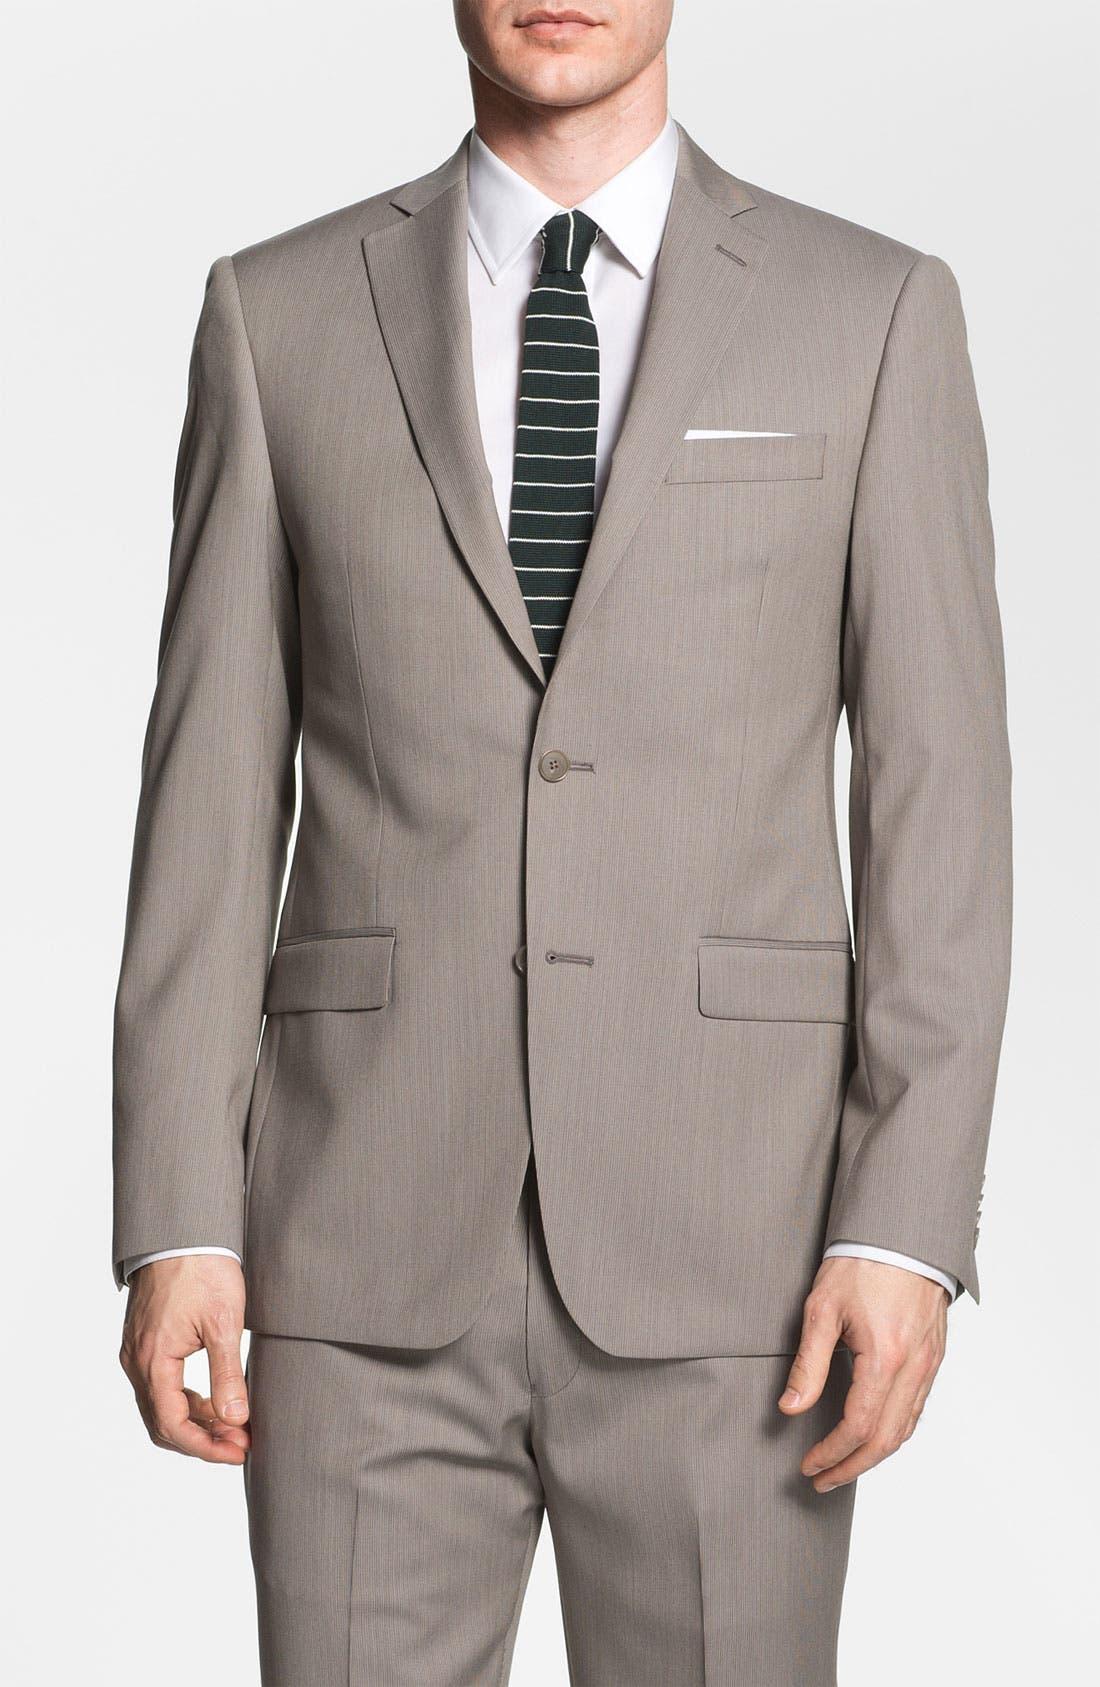 Alternate Image 1 Selected - Michael Kors Trim Fit Wool Suit